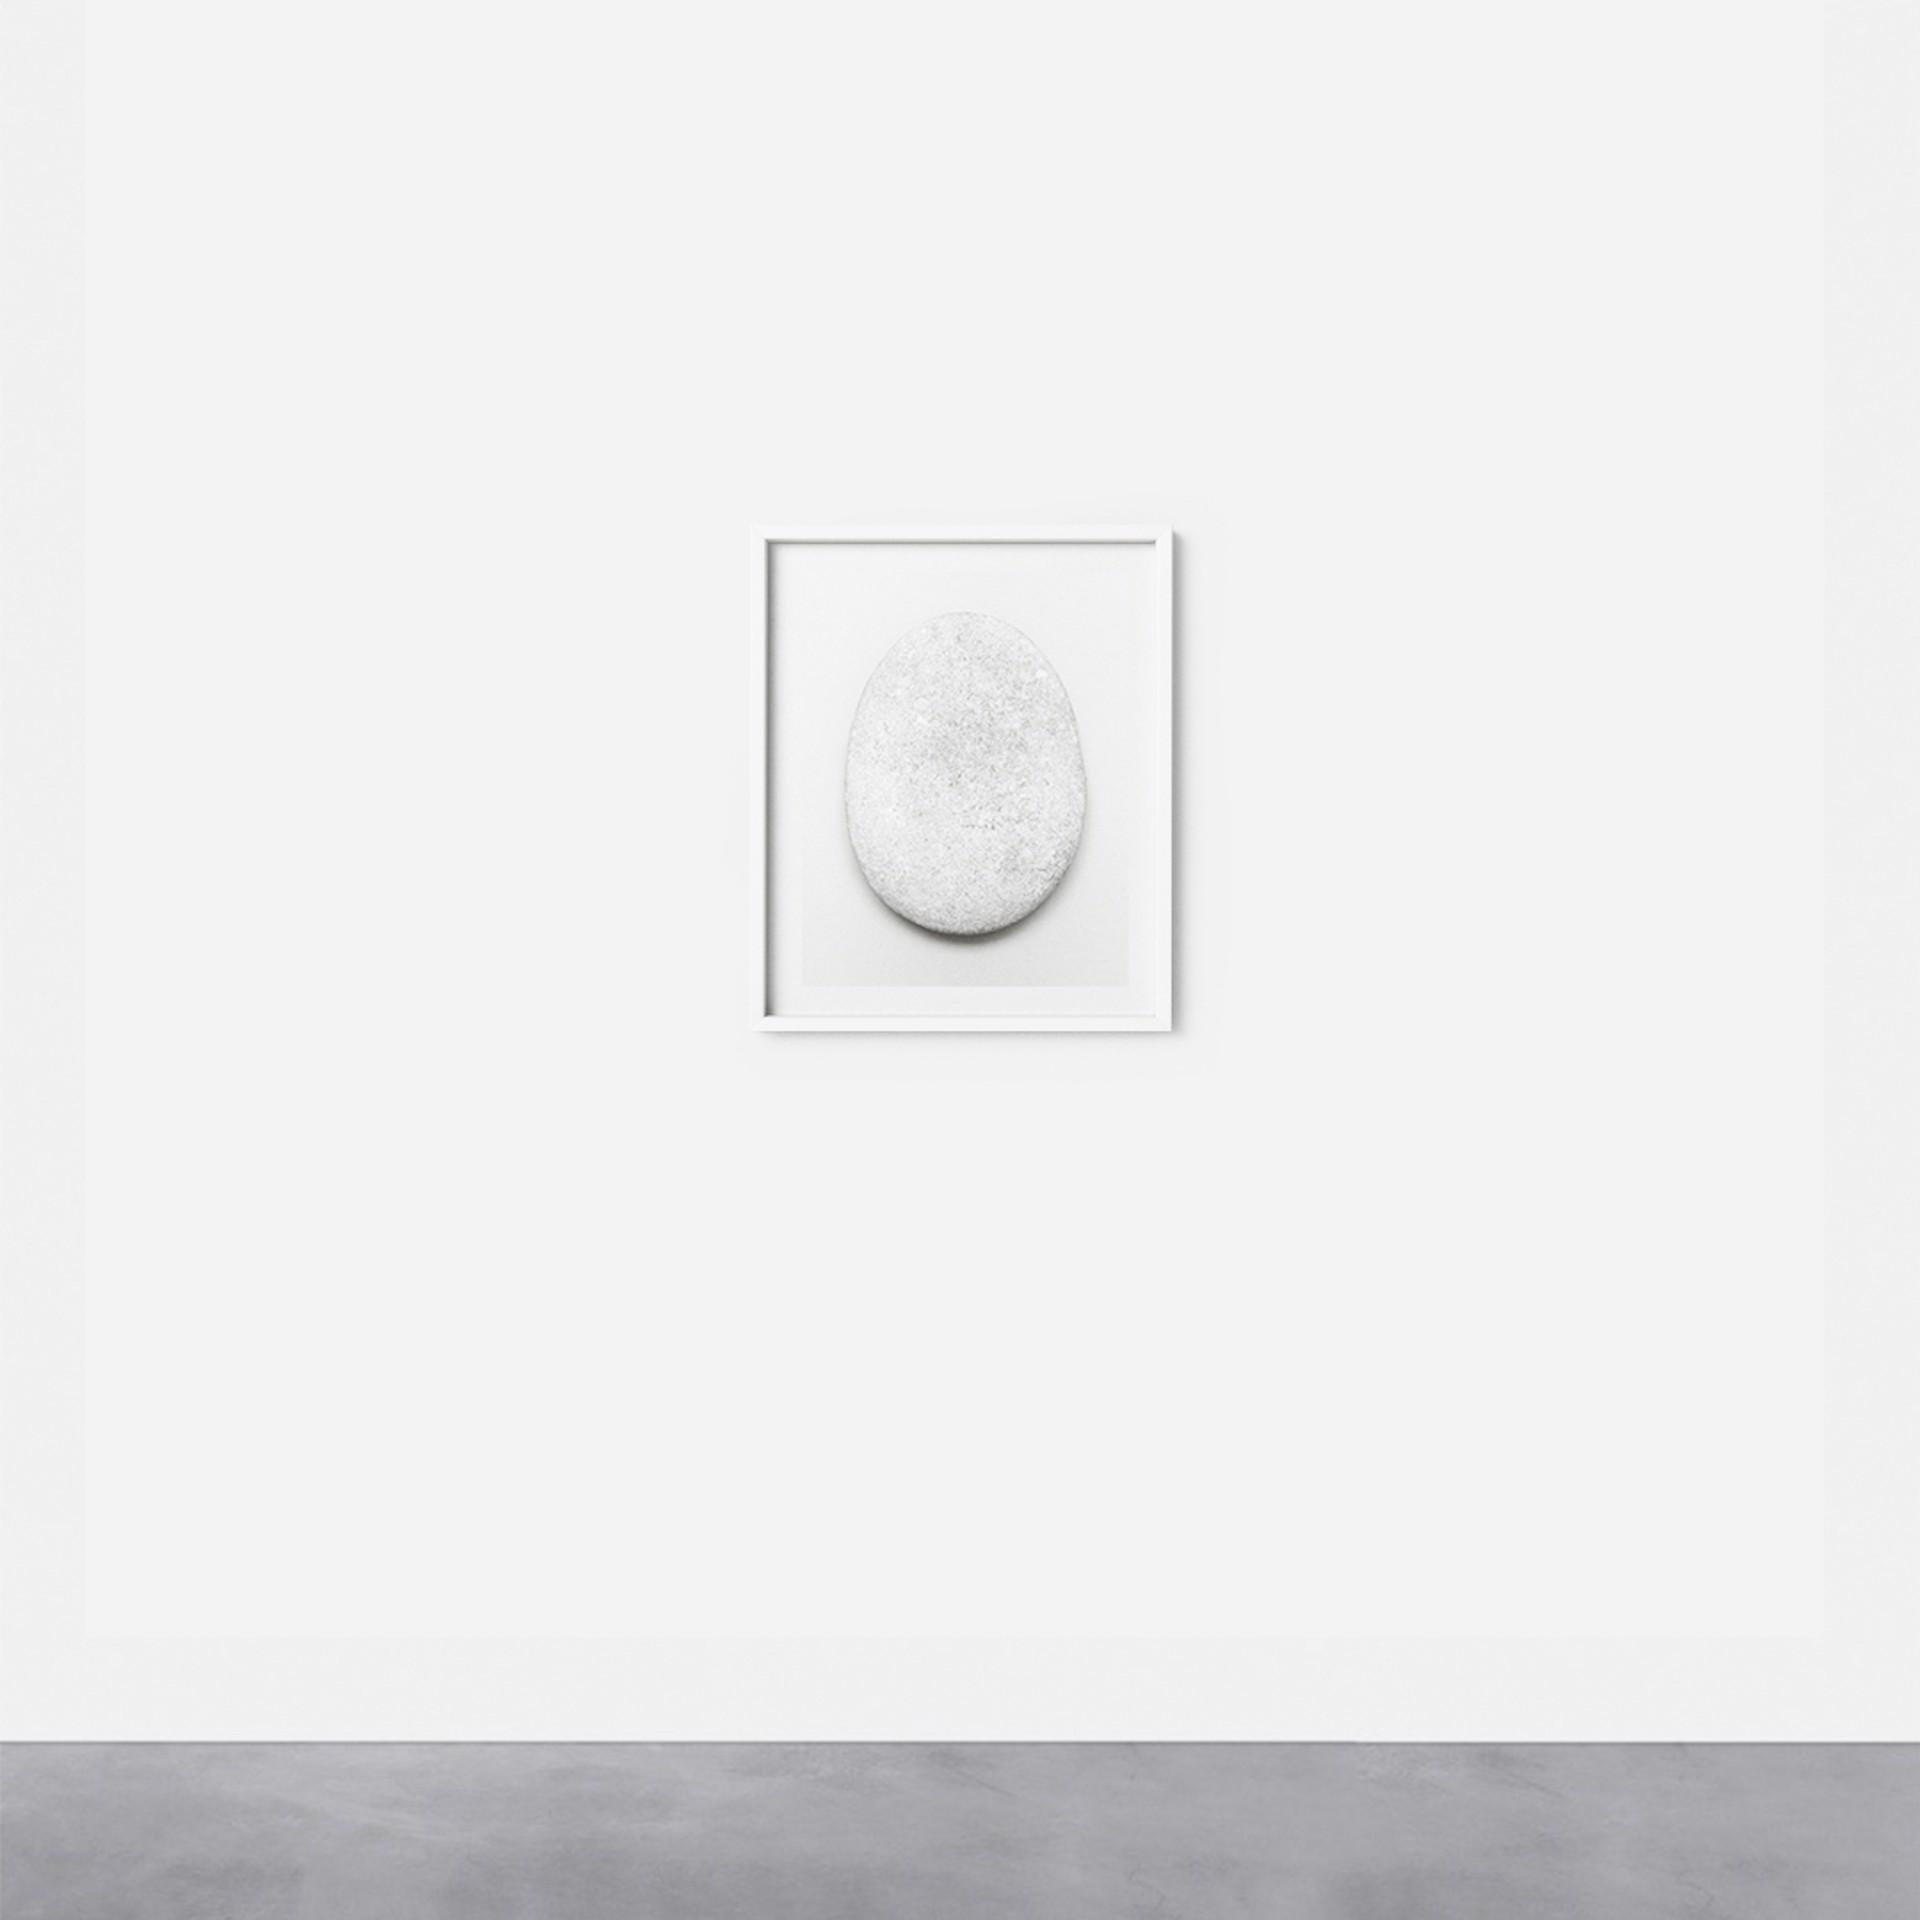 Luminous stone #17 by Gabriella Imperatori-Penn